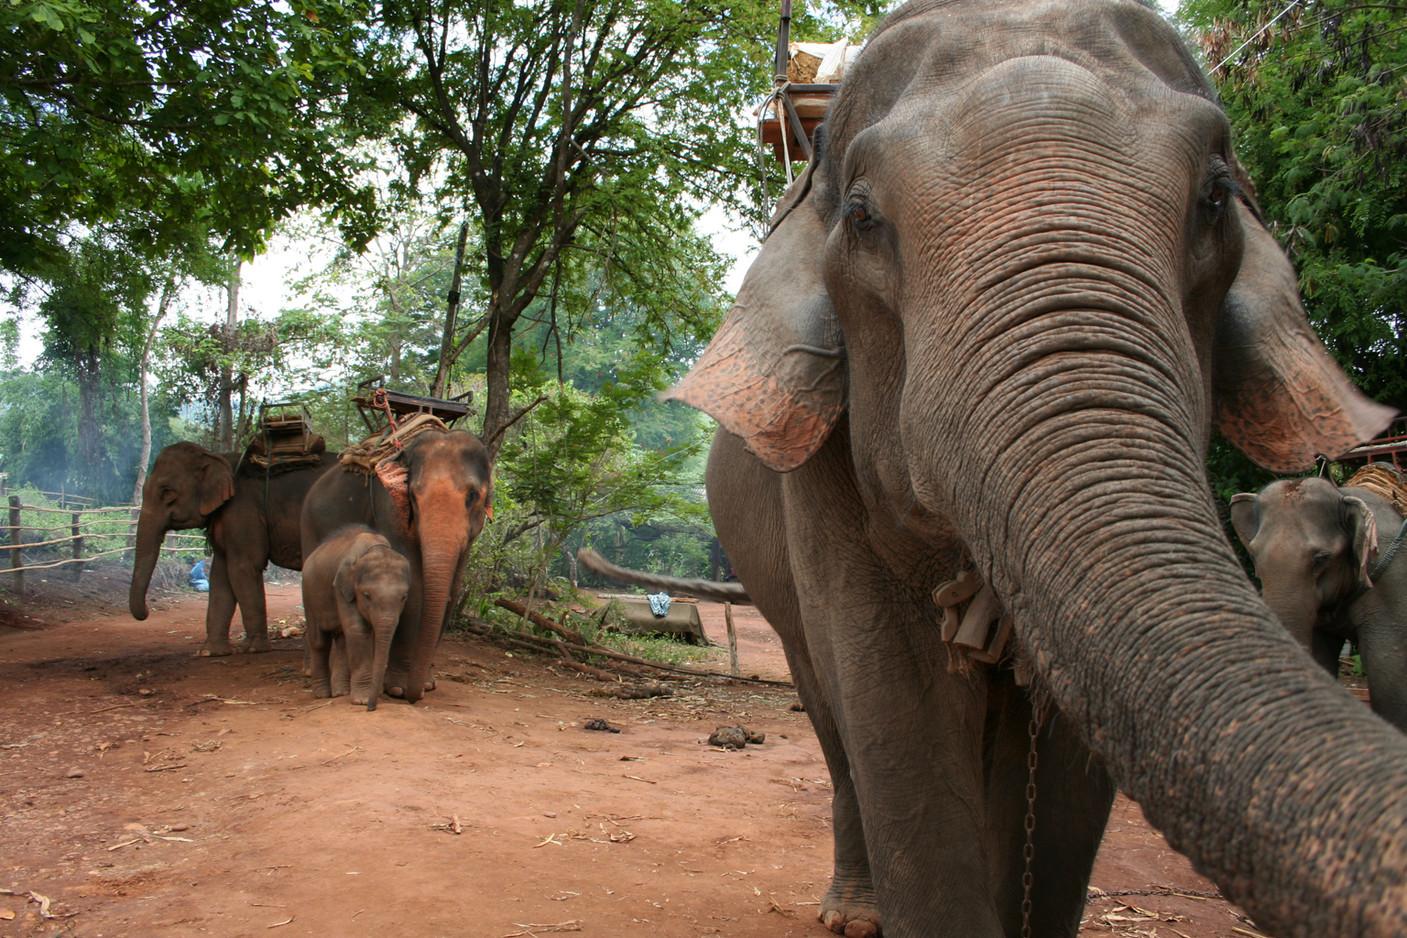 Elephant d'asie